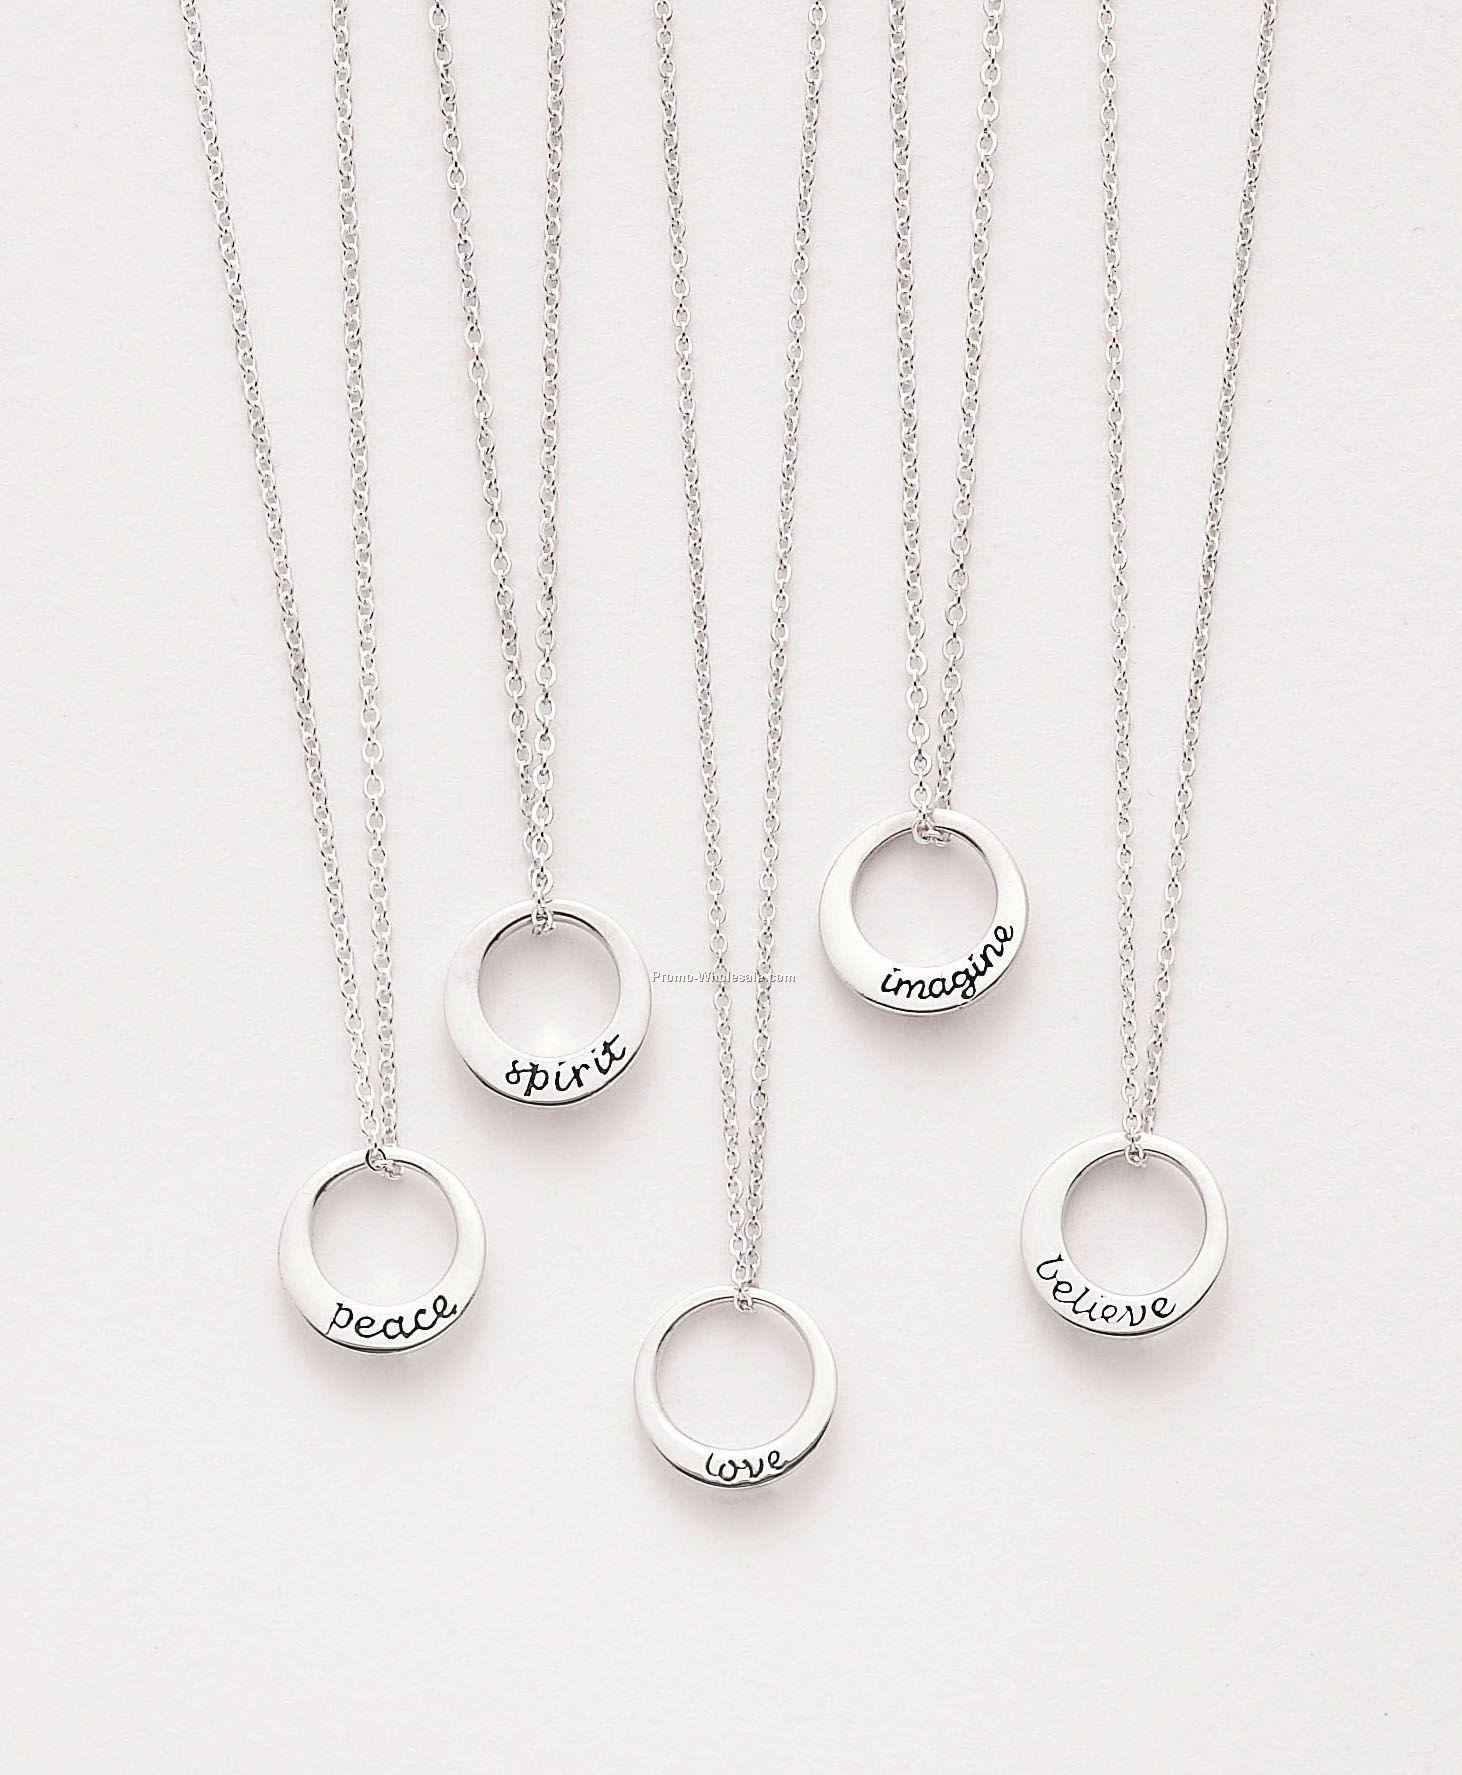 Elegant silver chain and pendant jewellrys website silver chain and pendant mozeypictures Gallery